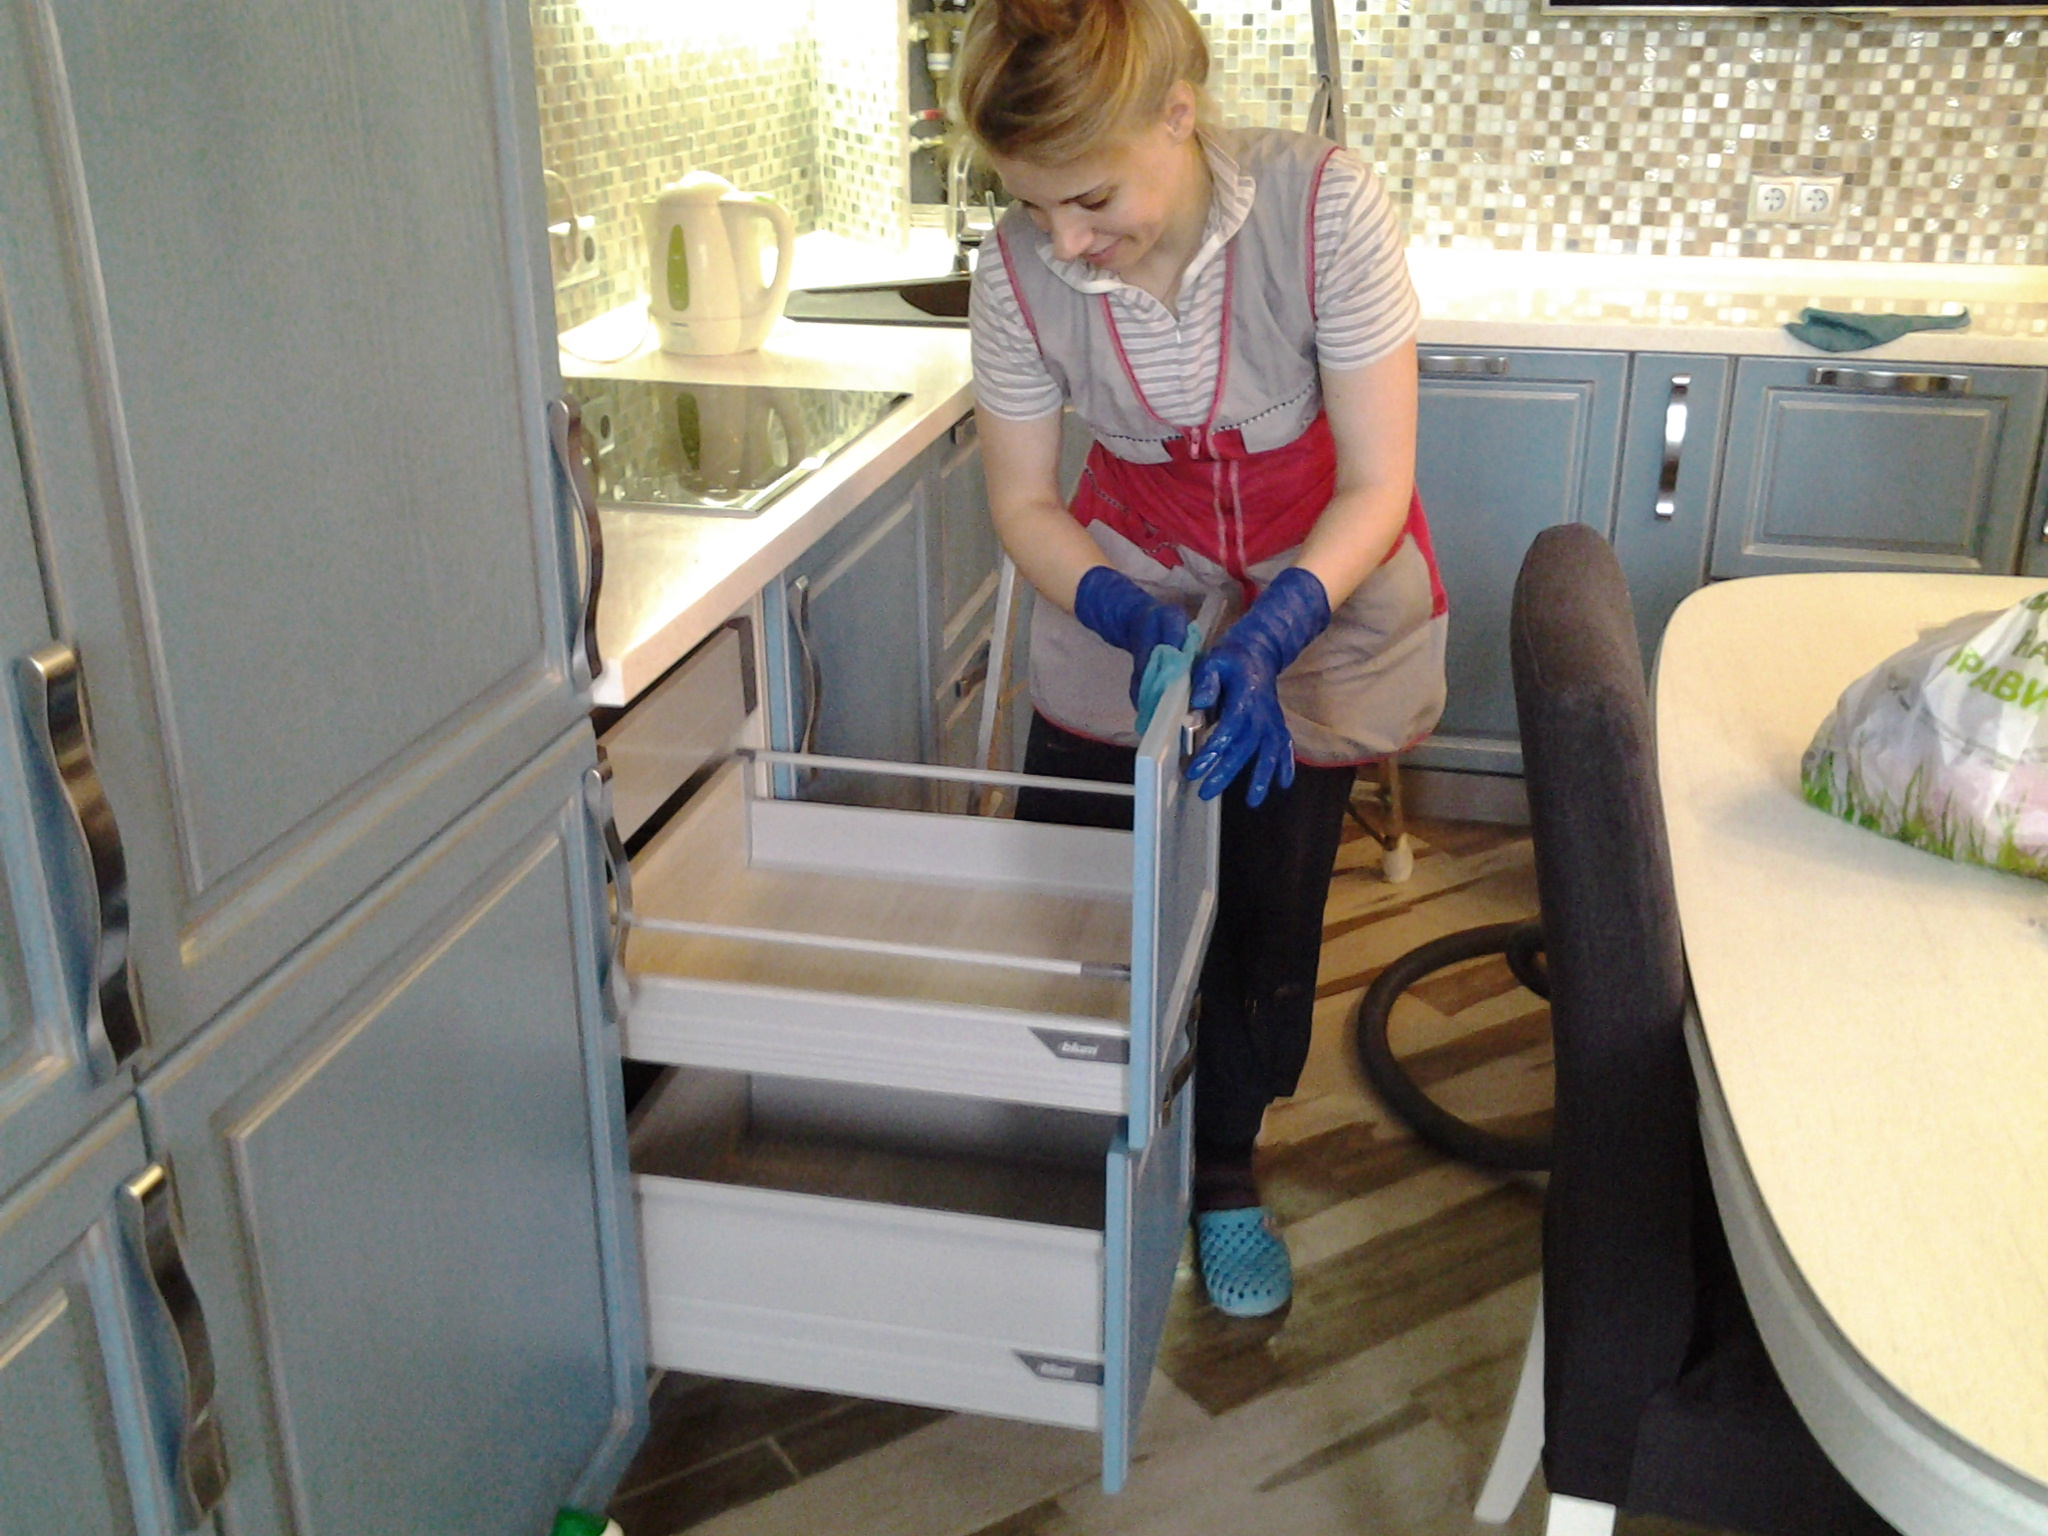 Уборка на кухне - правила и советы с 70